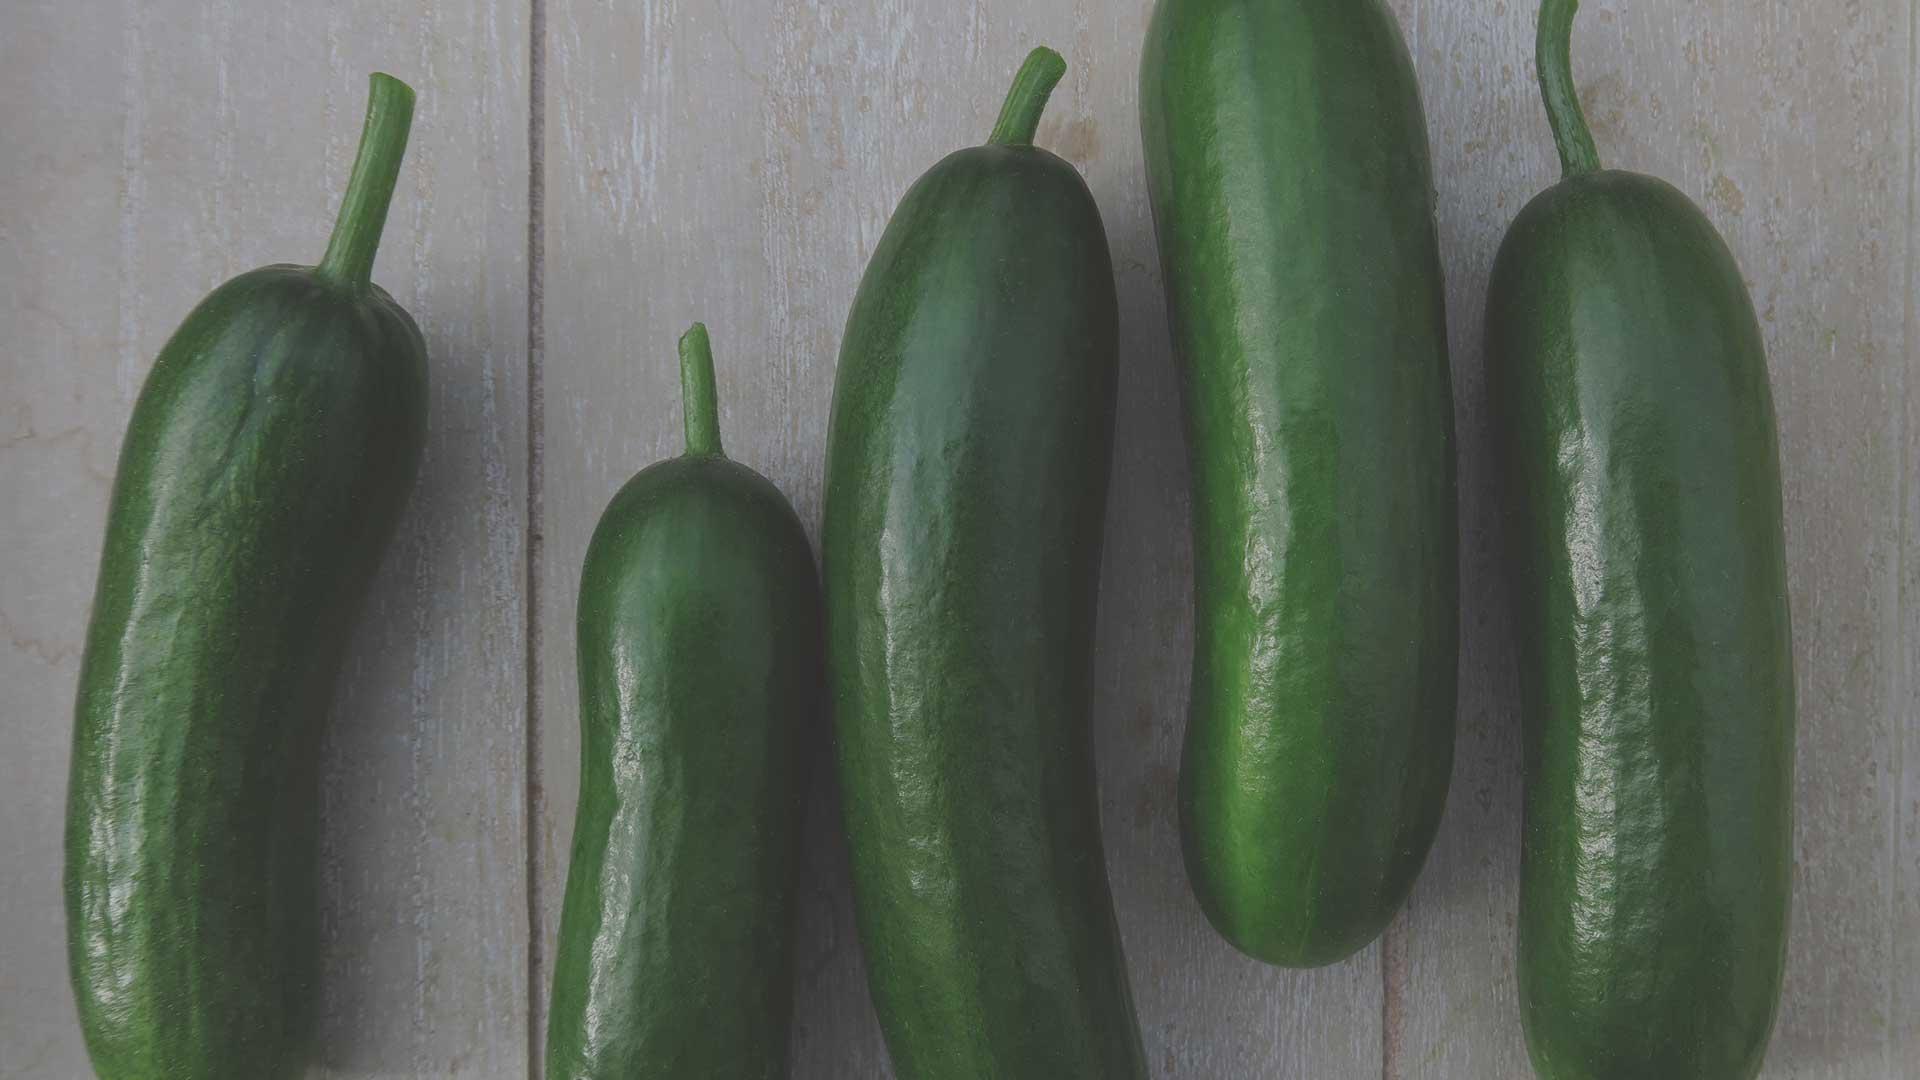 Organic Non-GMO Minime F1 Cucumber from High Mowing Organic Seeds